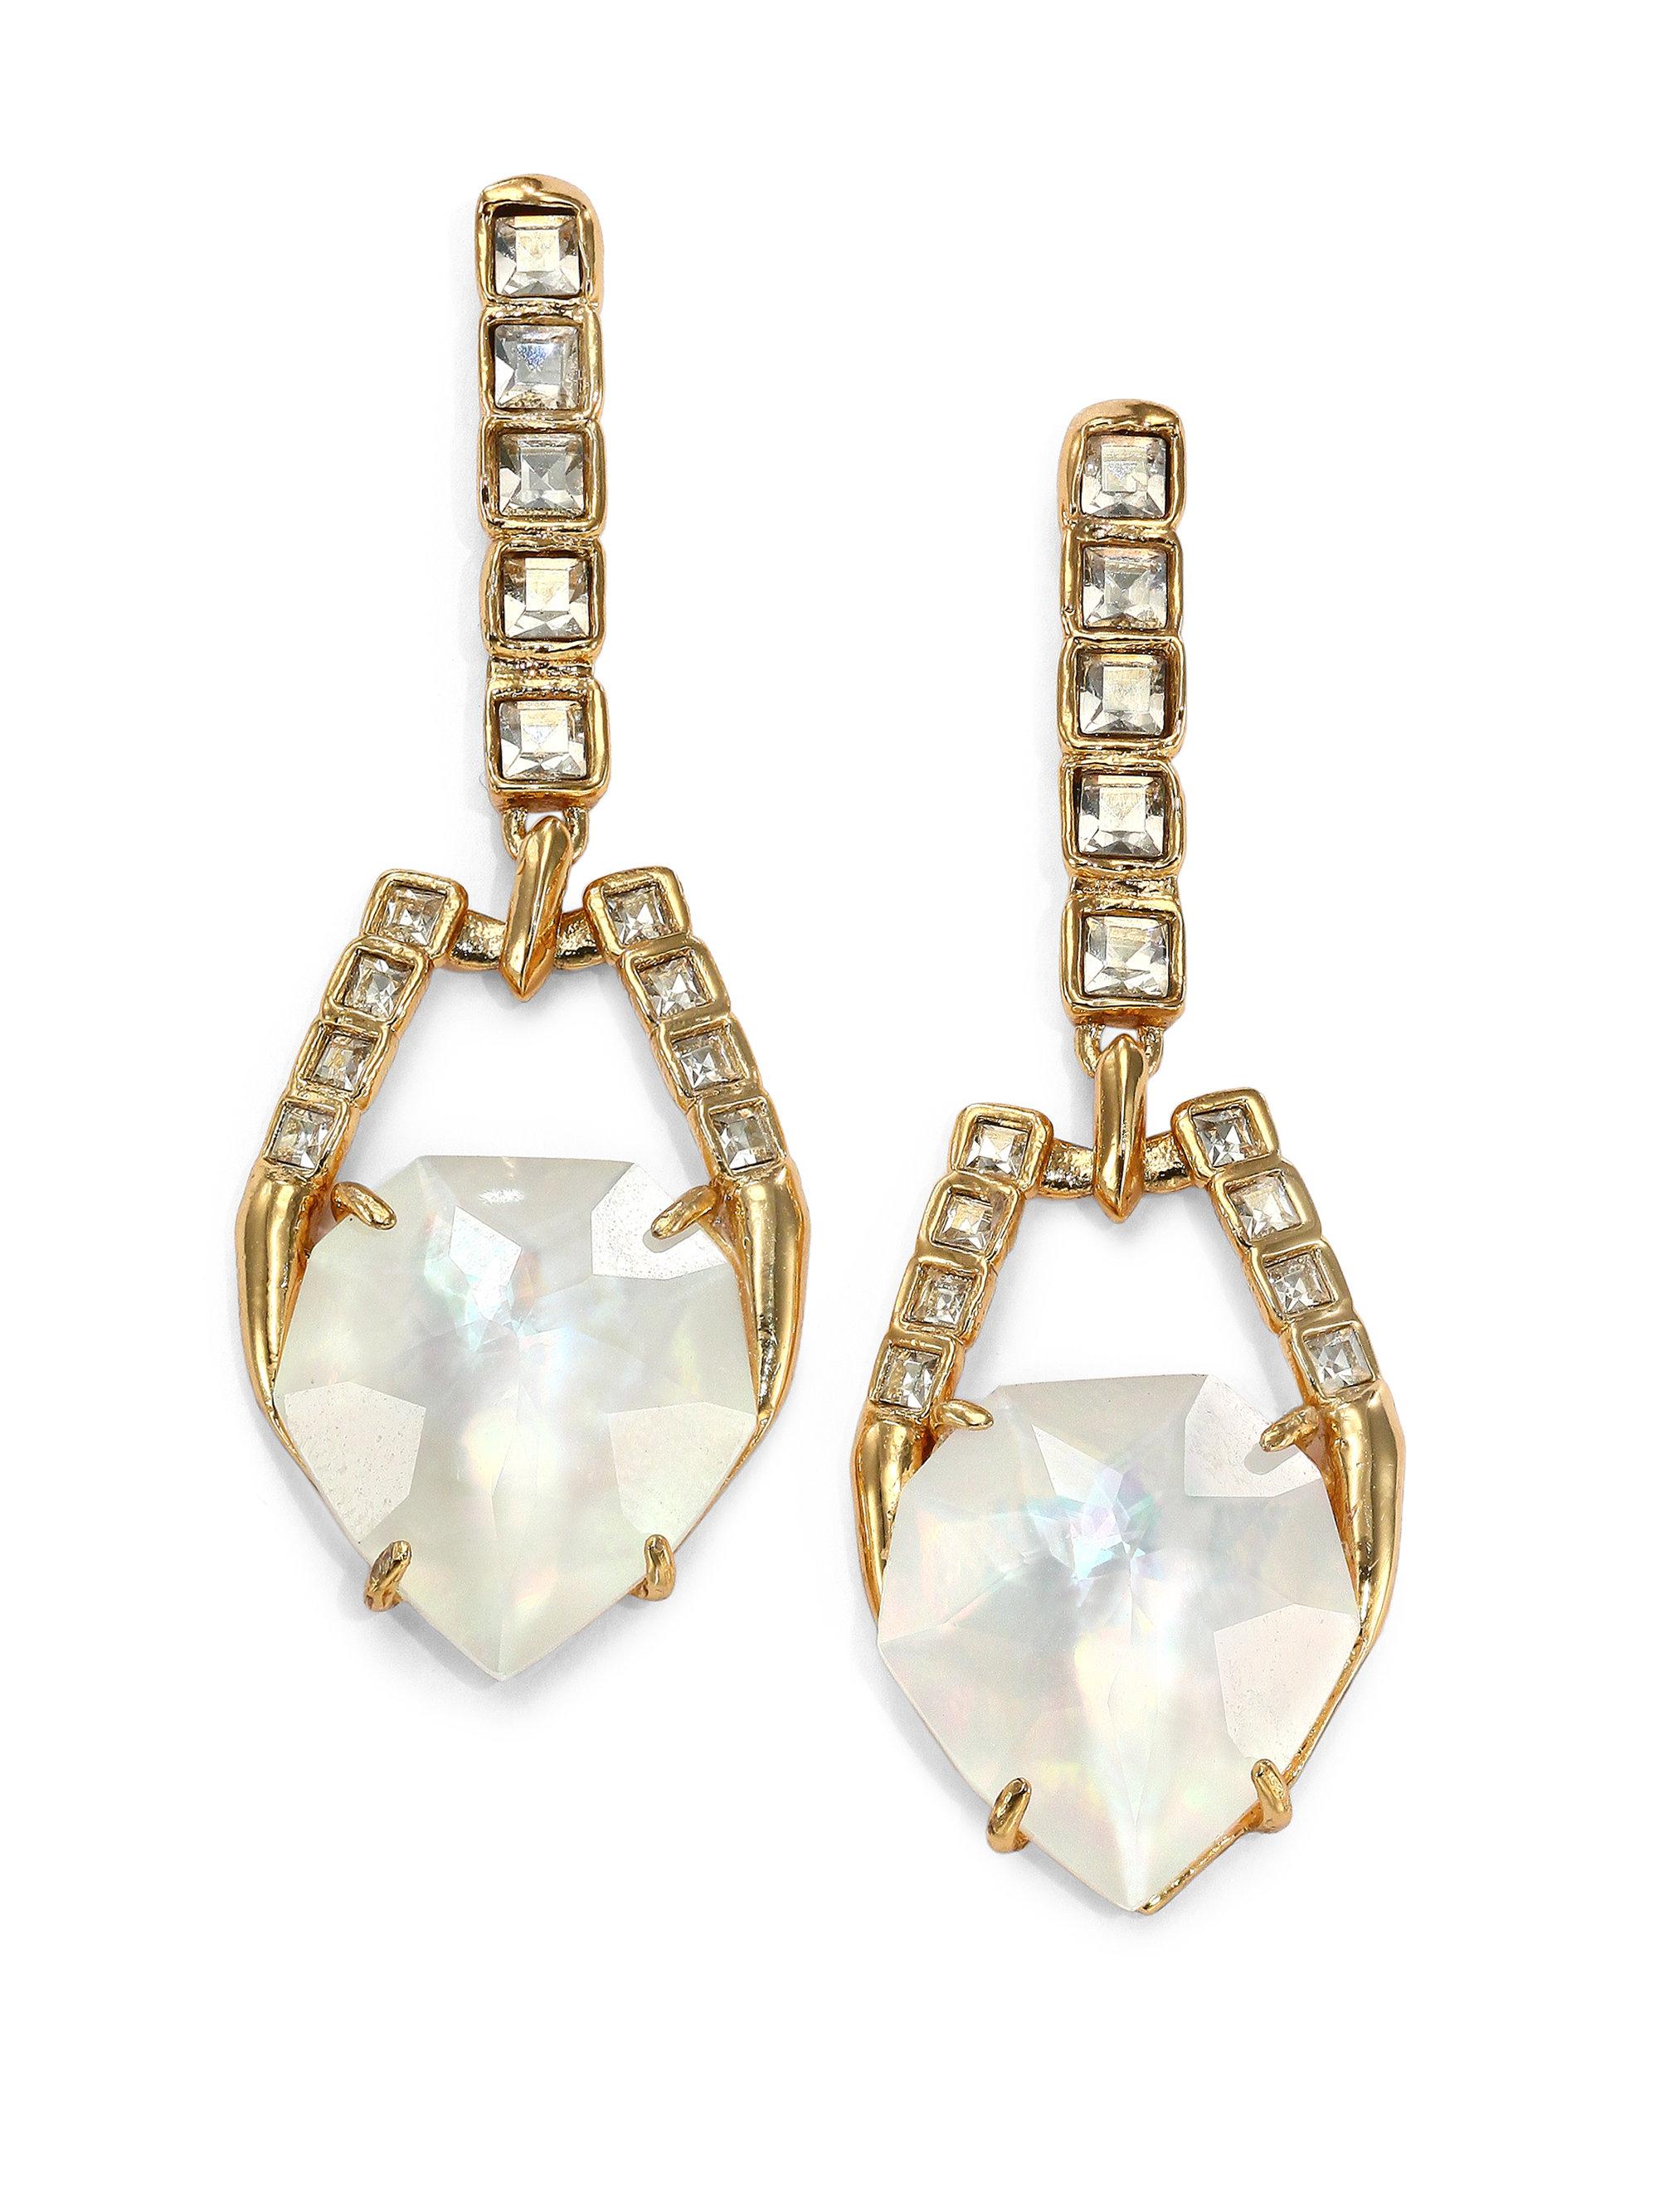 Alexis Bittar Mosaic Crystal Drop Earrings, Clear